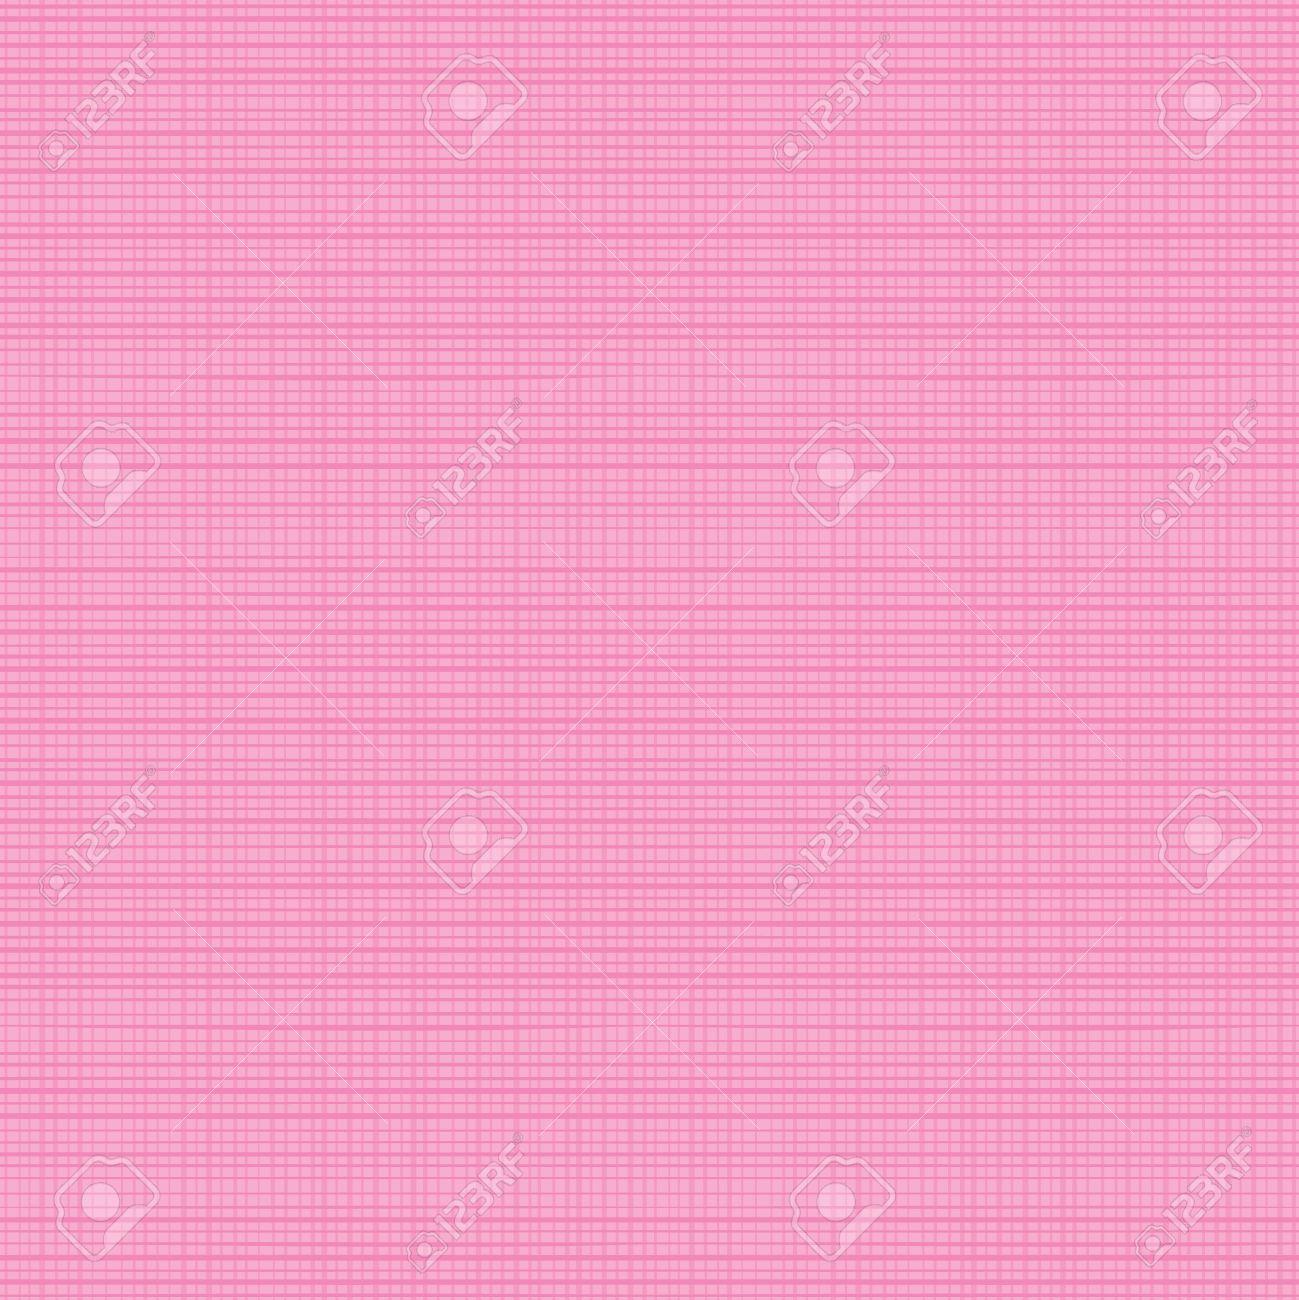 seamless usted ve 4 azulejos rosa textura de la tela adecuado para pascua - Azulejos Rosa